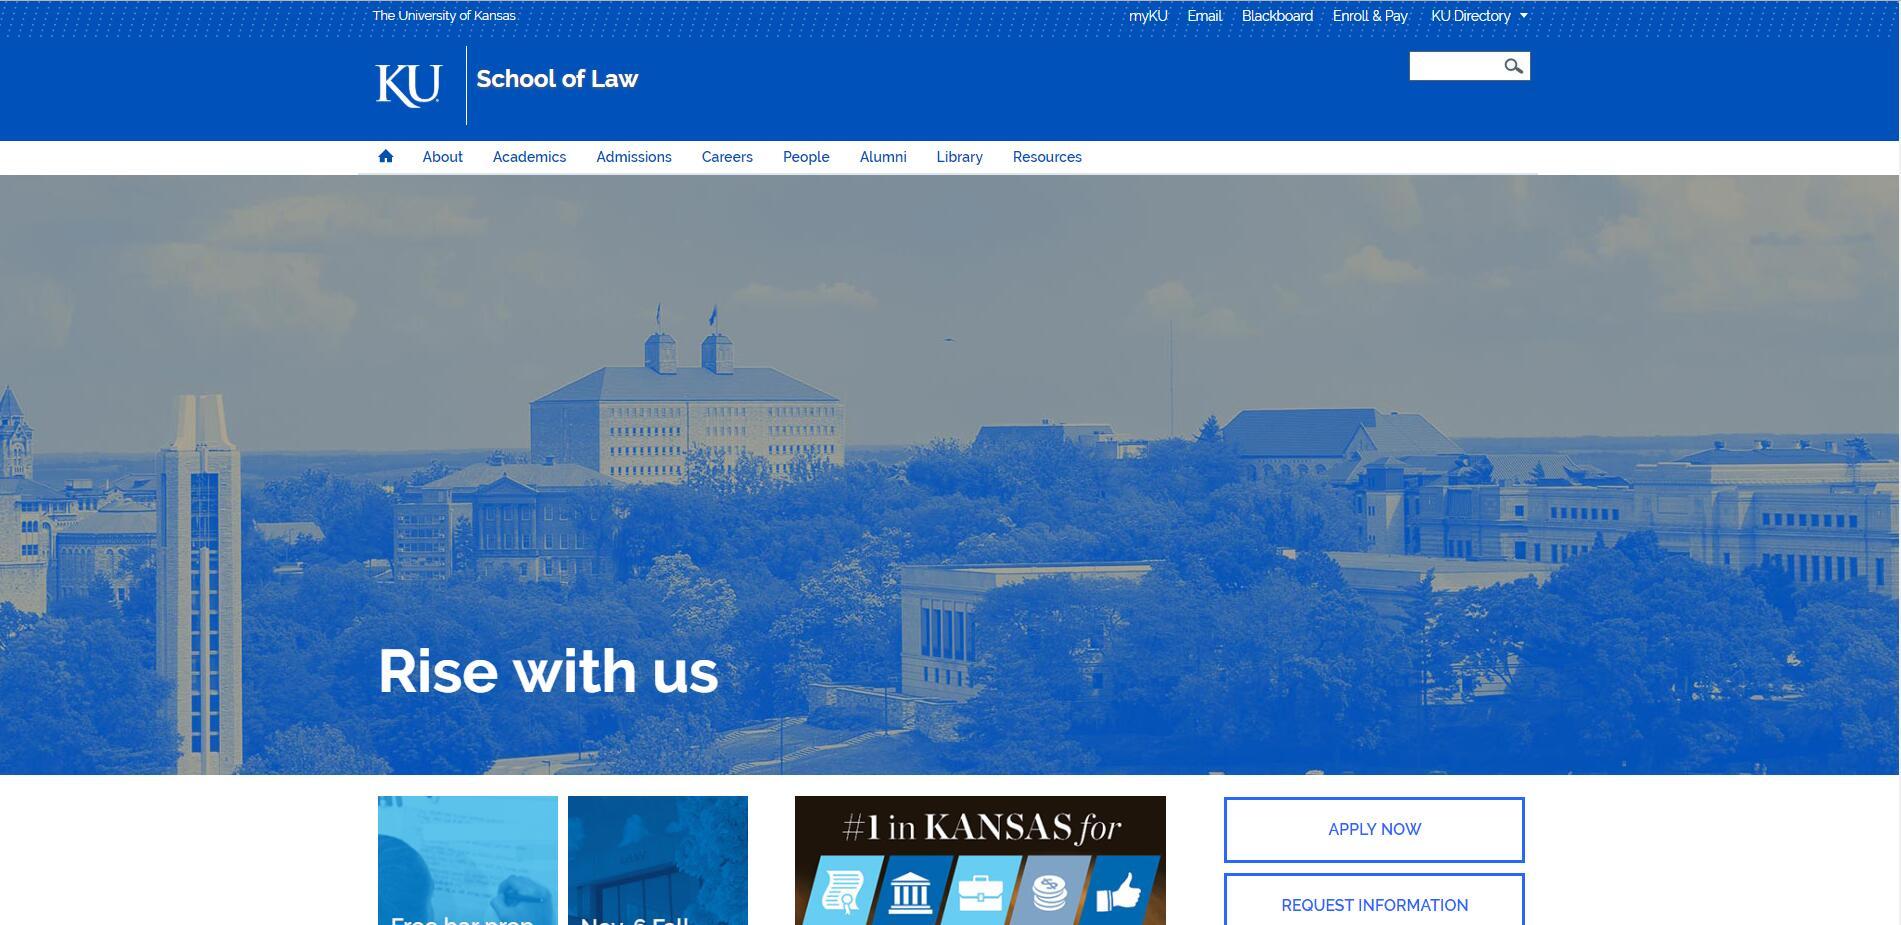 The School of Law at University of Kansas